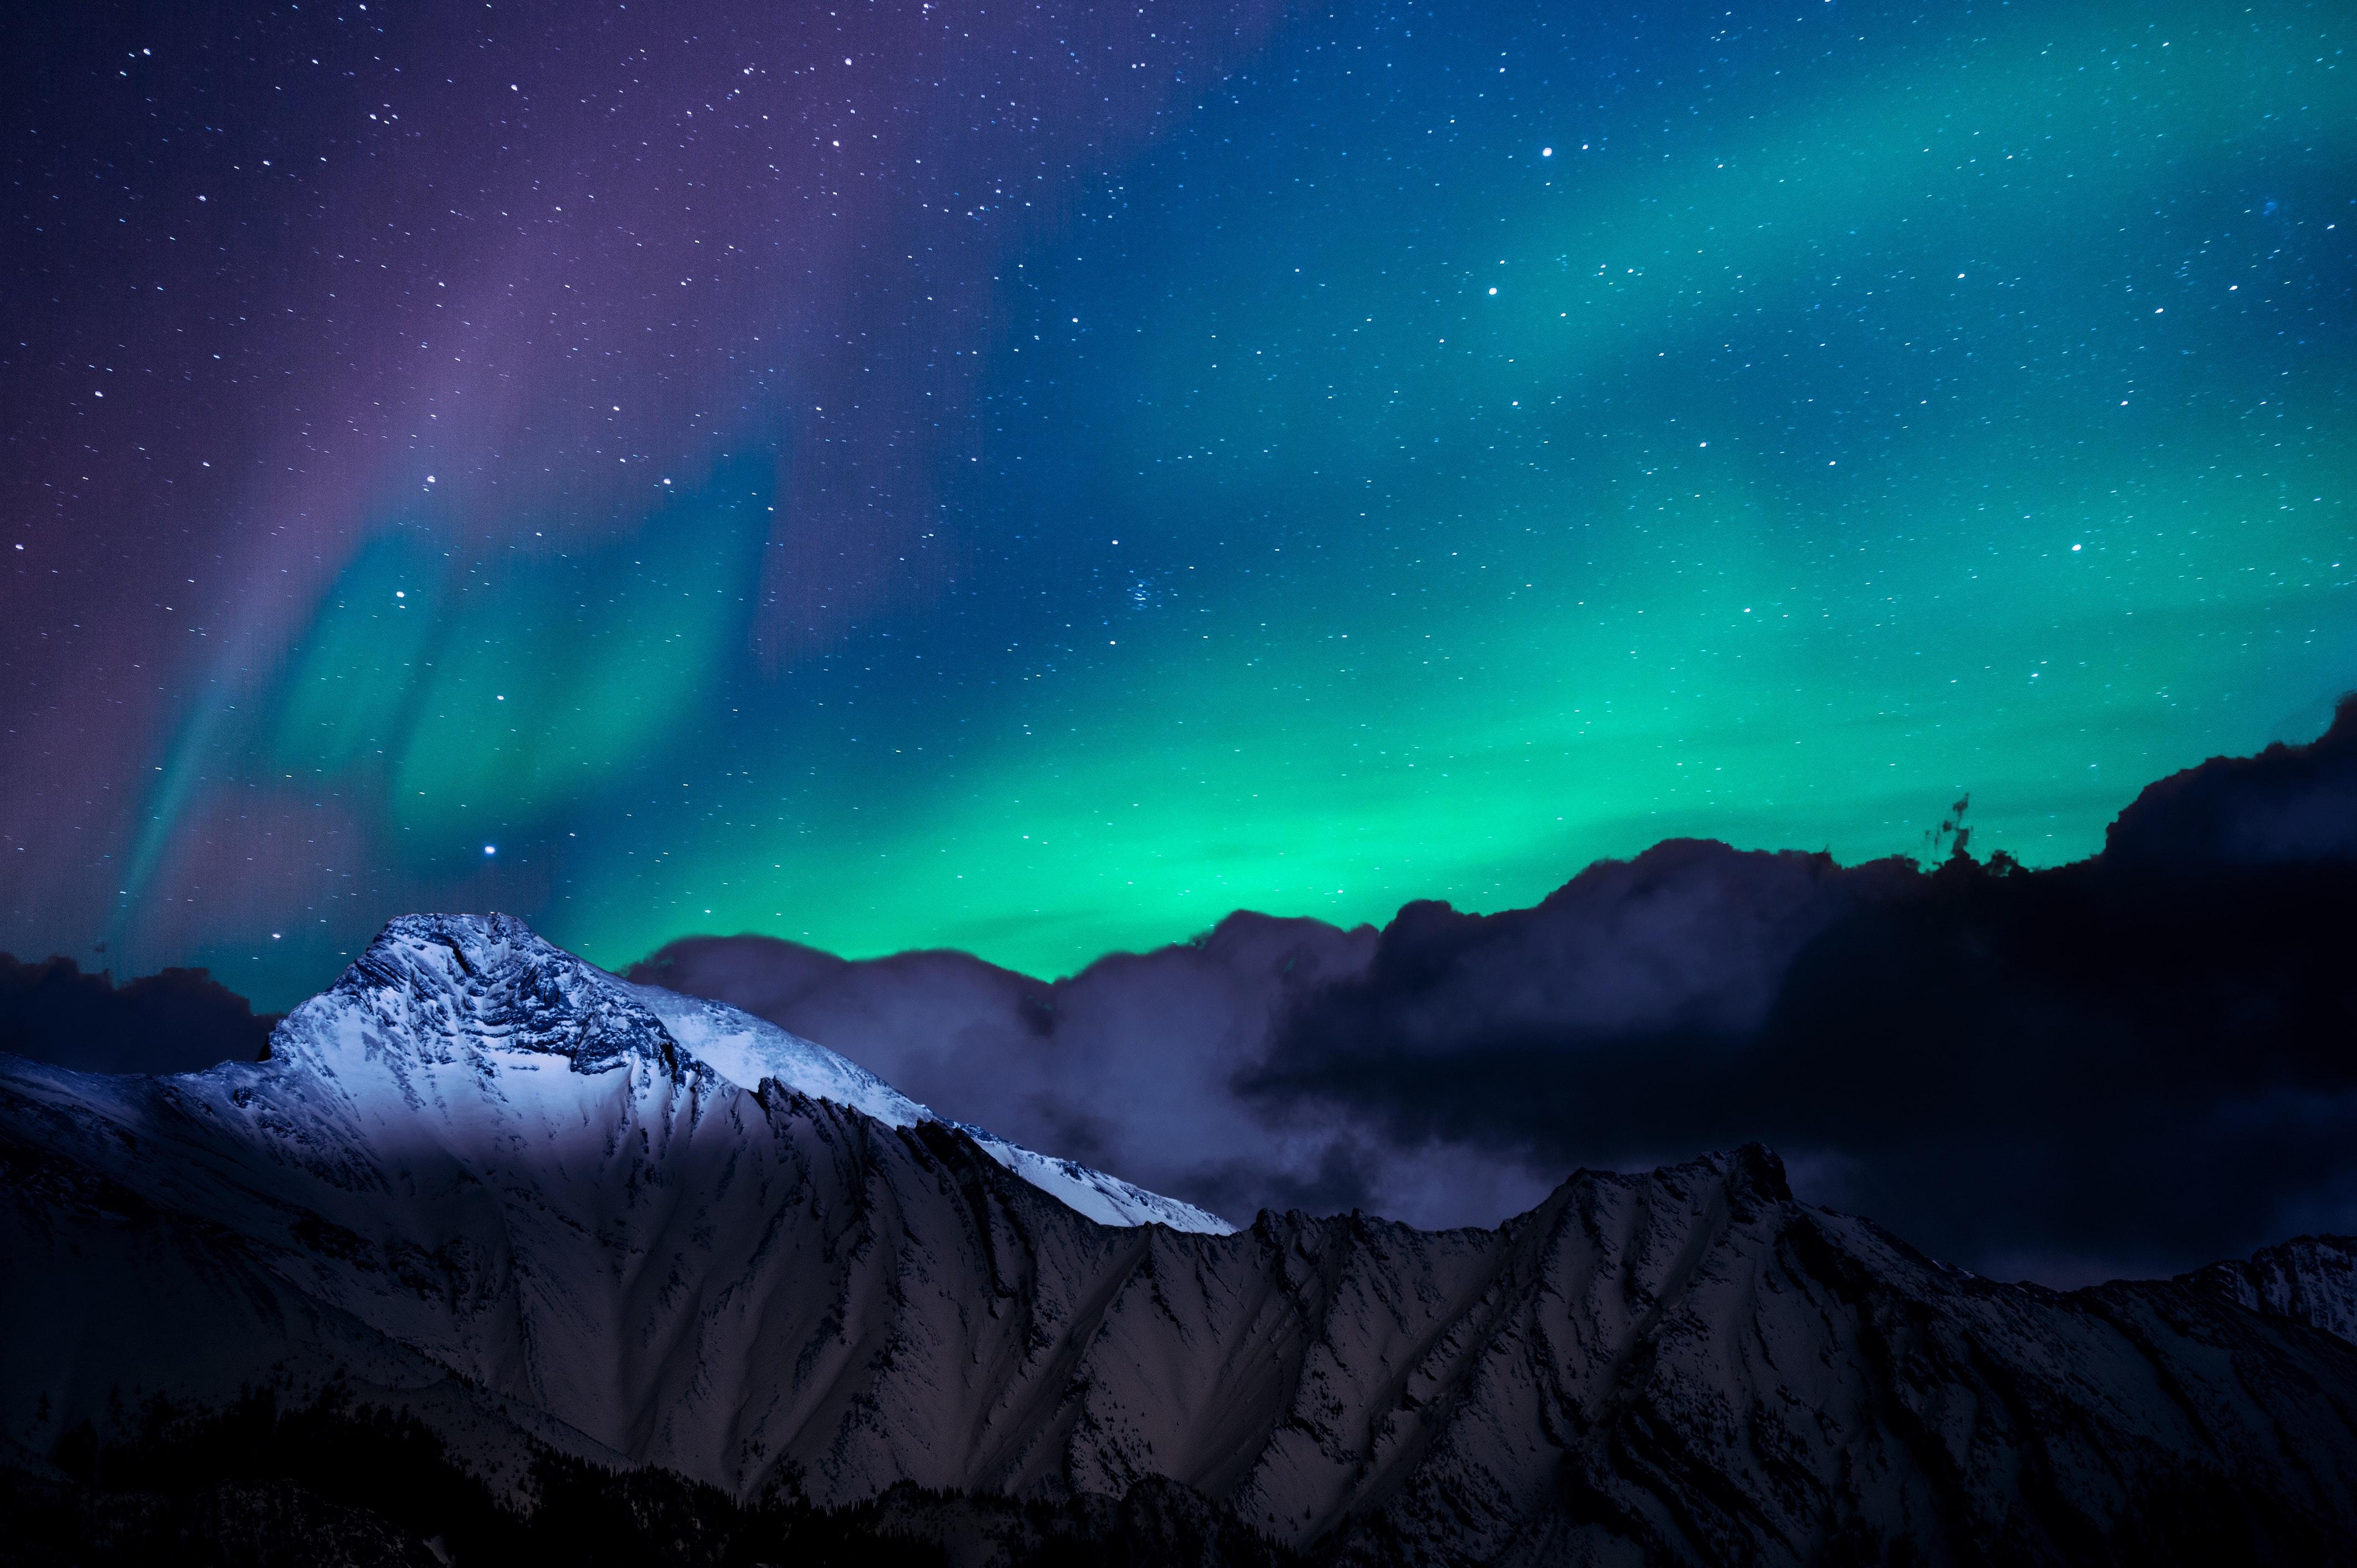 Northern lights night sky mountains landscape 4k hd - Night mountain wallpaper 4k ...